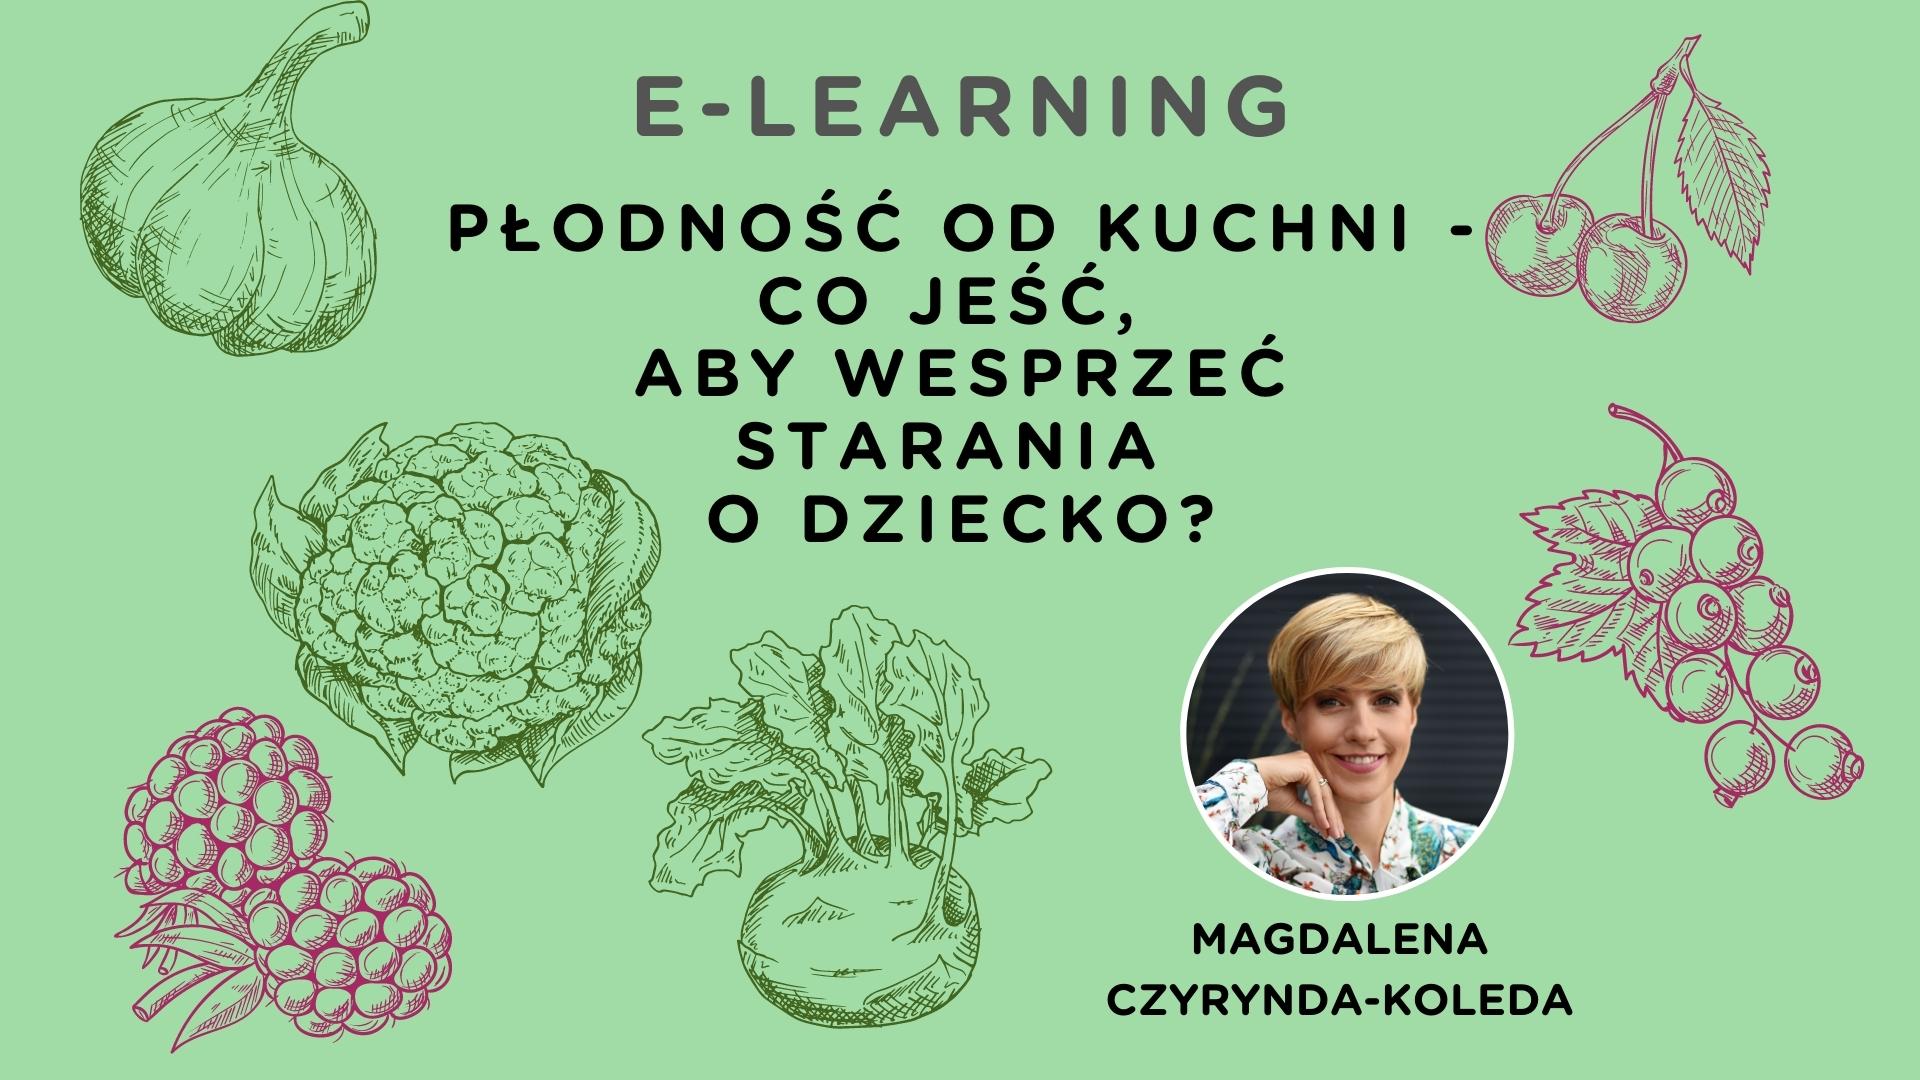 dieta od kuchni e-learning